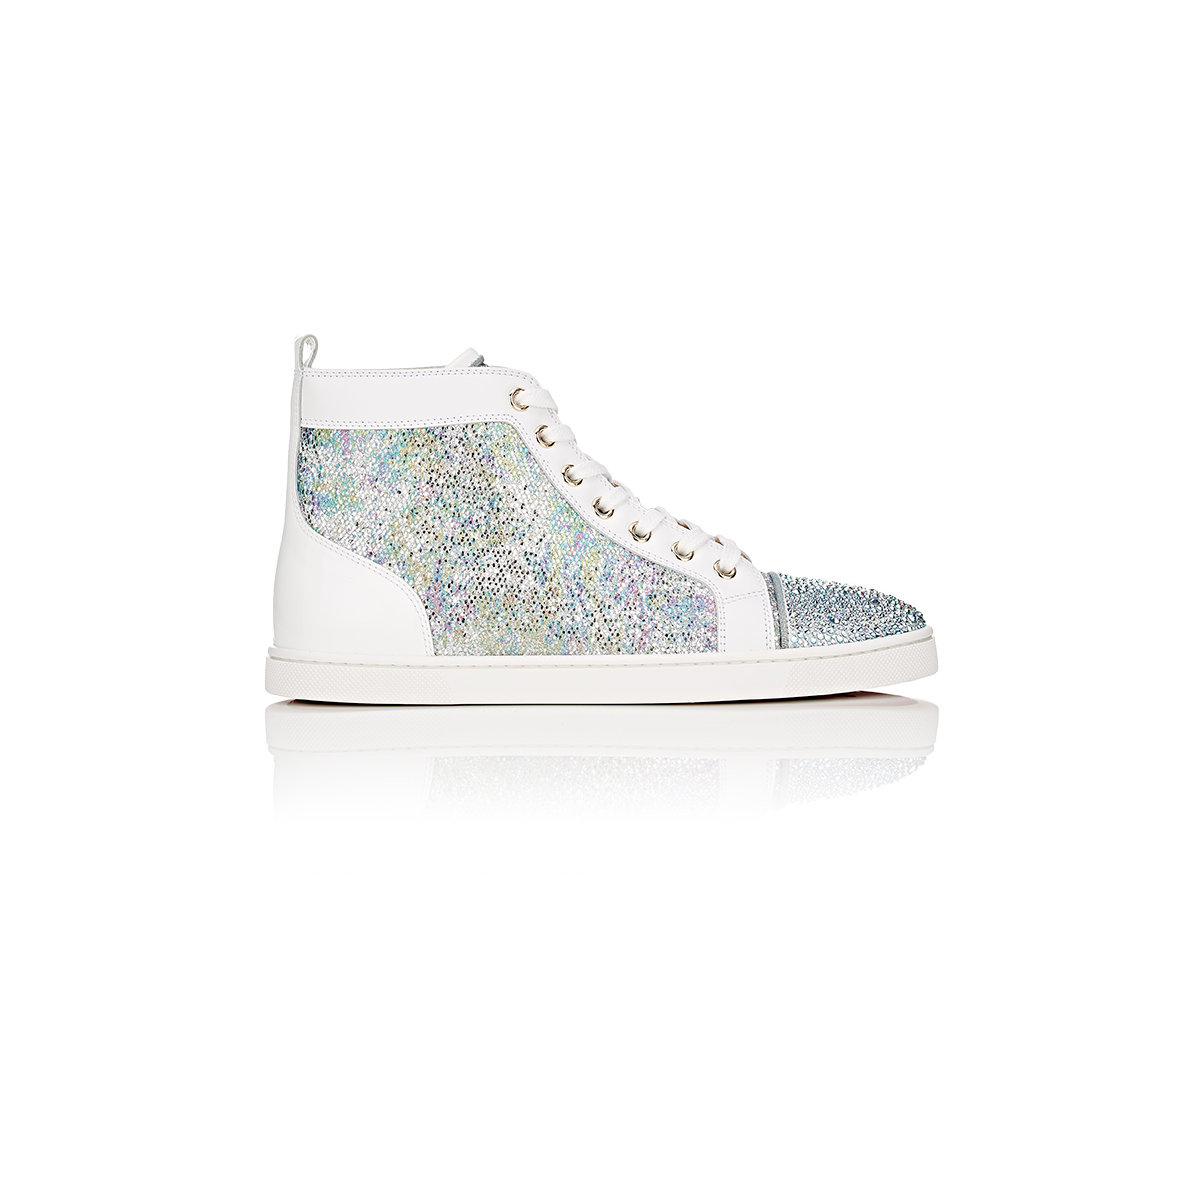 ac4b8f05b660 Lyst - Christian Louboutin bip Bip Strass Woman Flat Sneakers